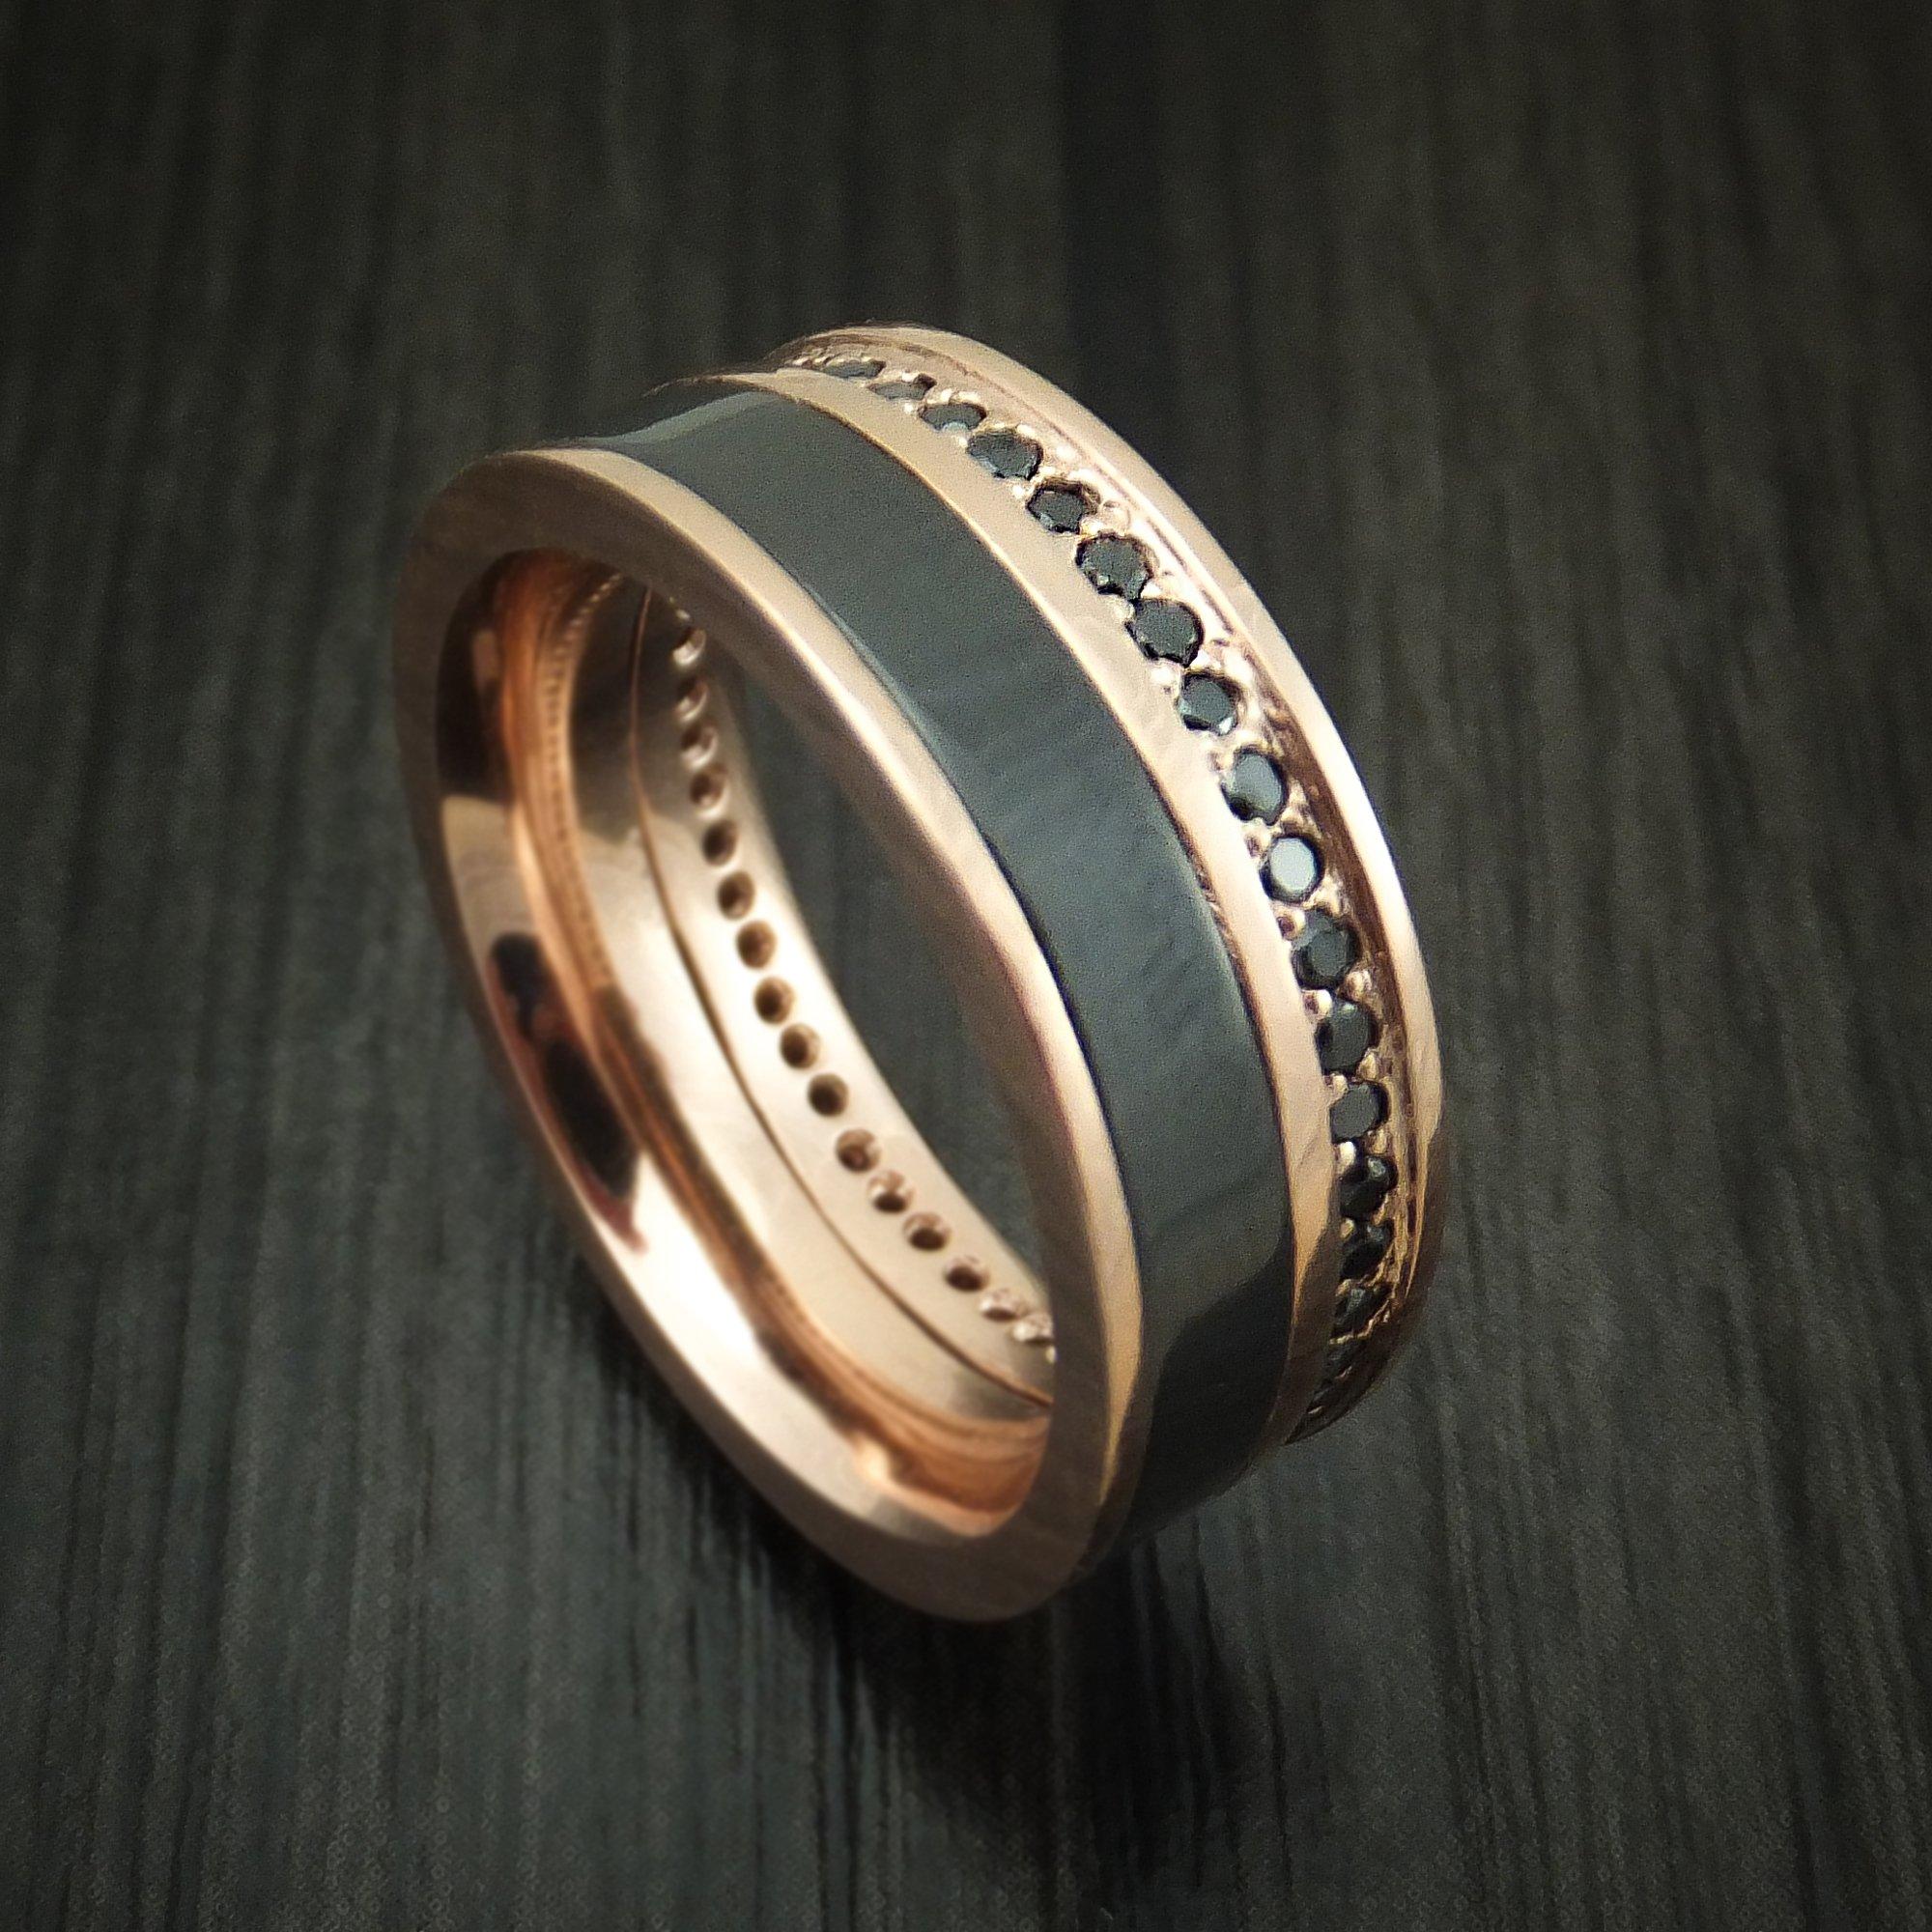 14K Rose Gold Ring with Black Zirconium and Black Diamond